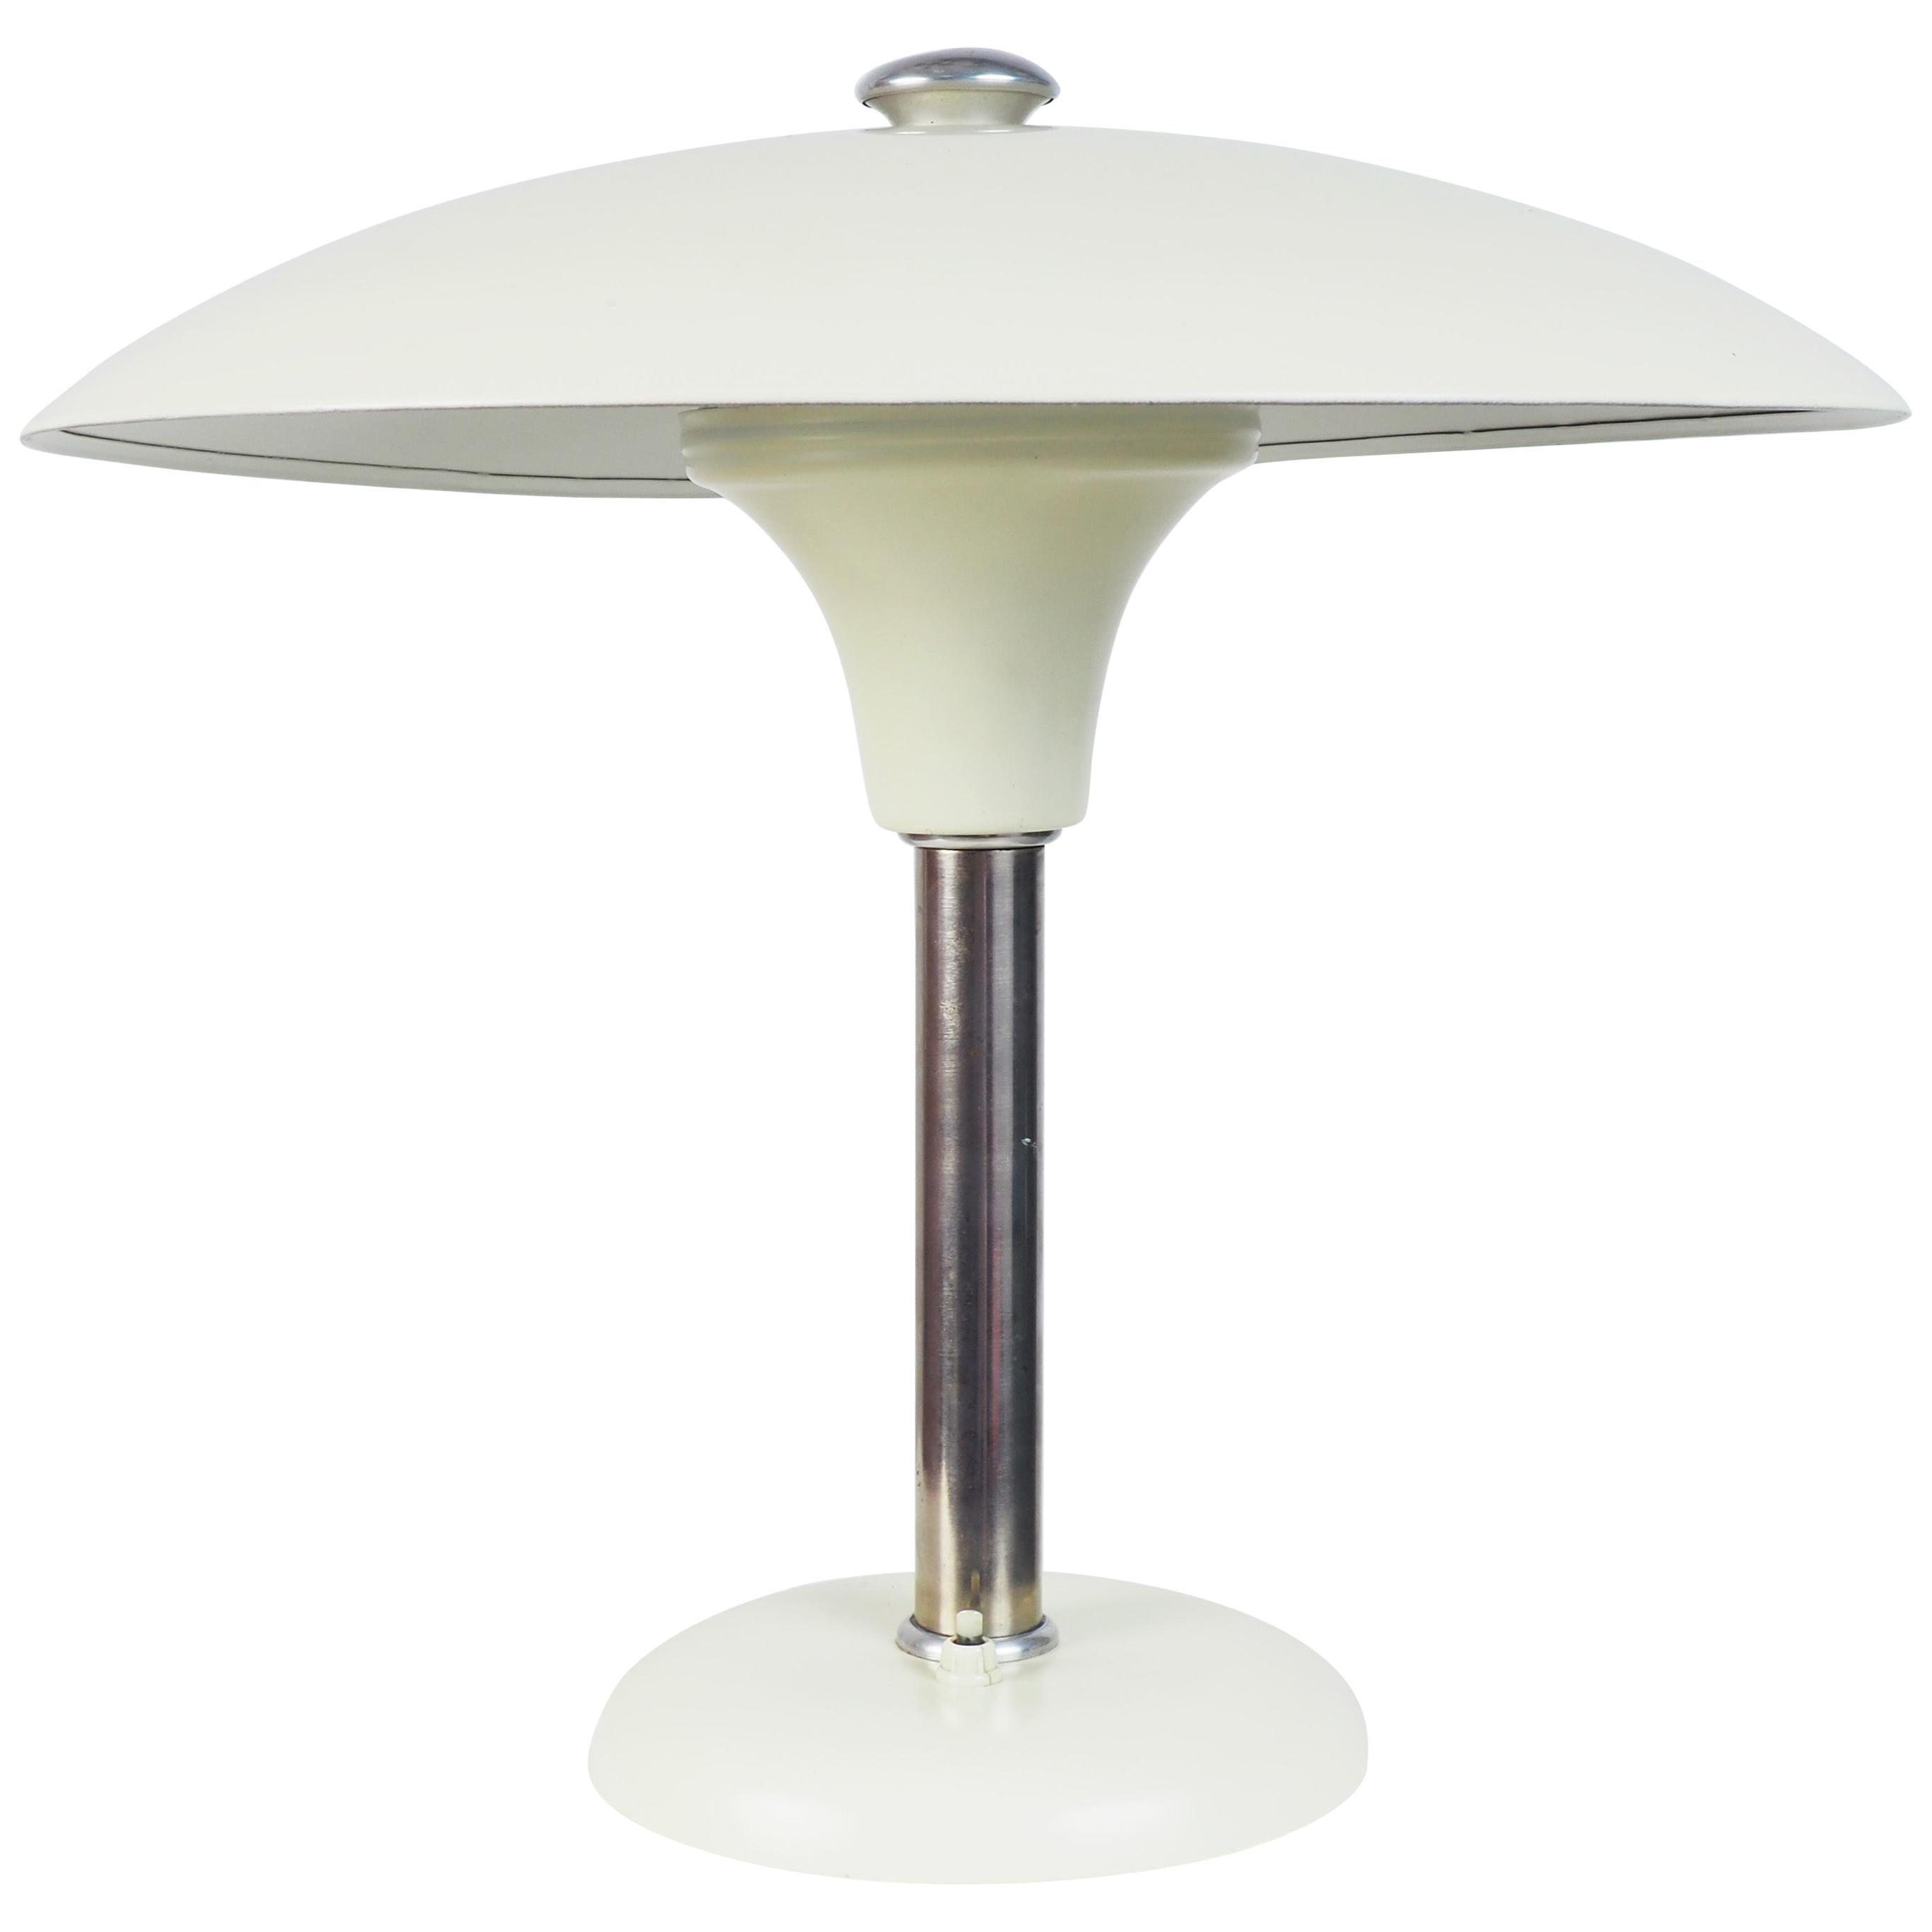 Bauhaus Table Lamp Designed by Max Schumacher